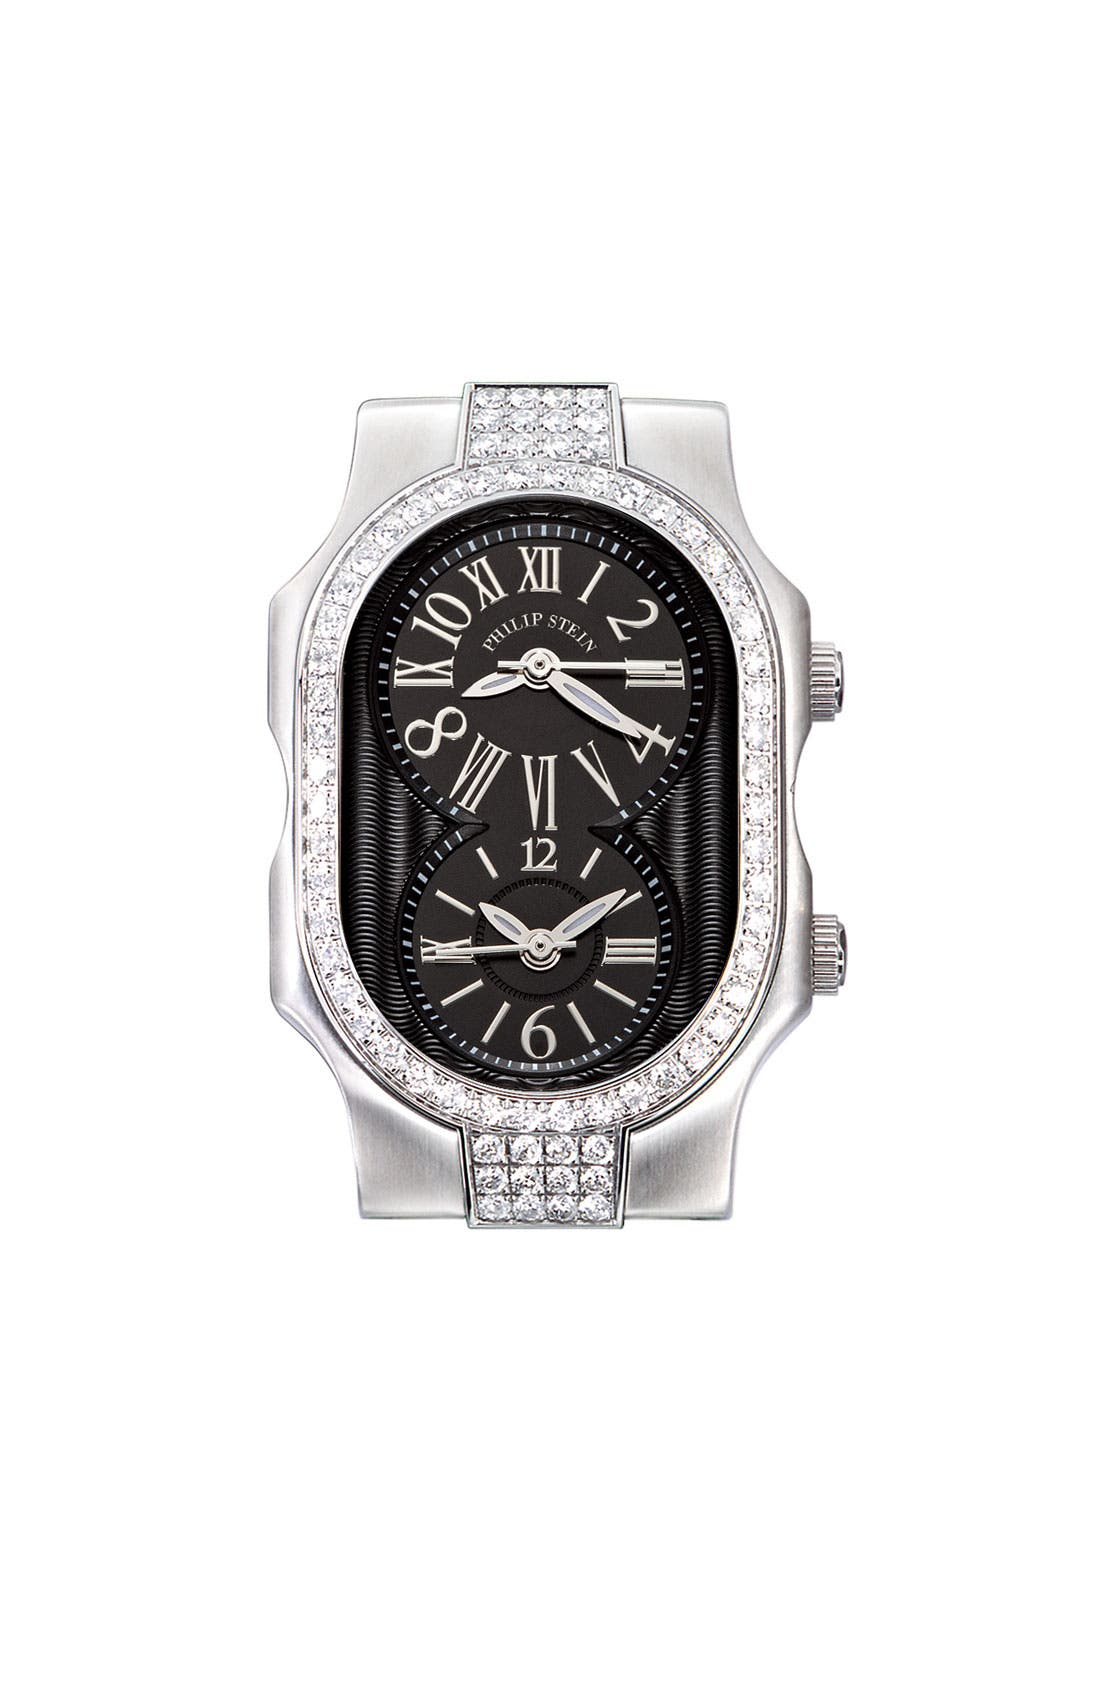 Alternate Image 1 Selected - Philip Stein® 'Signature' Small Double Diamond Bezel Watch Case